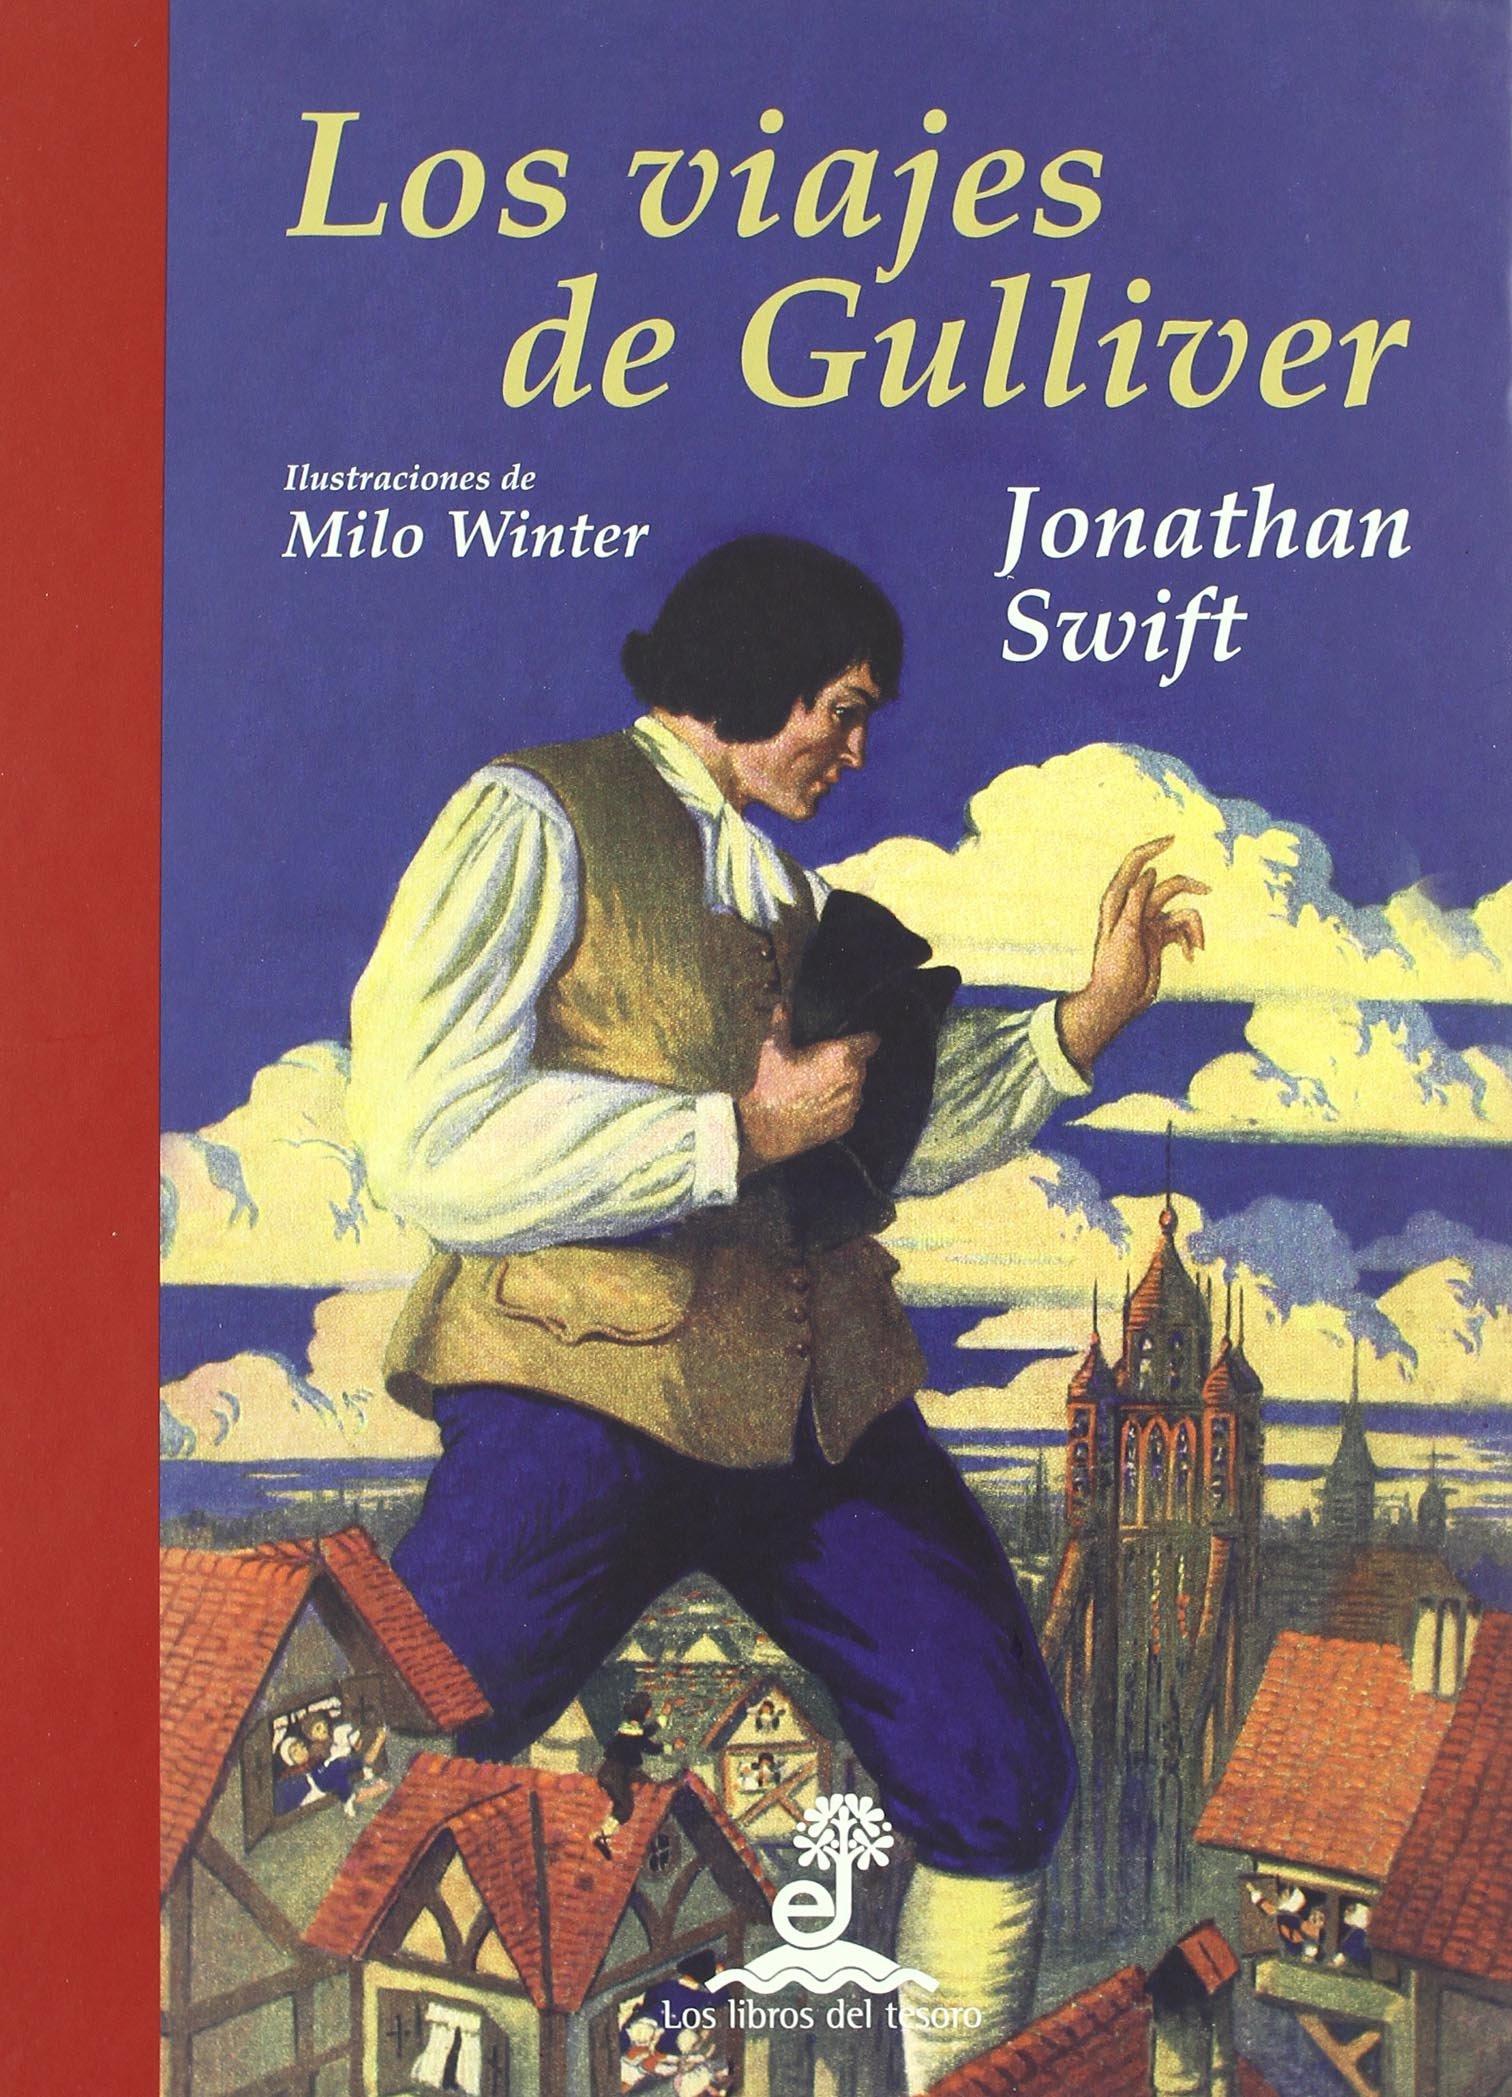 Los Viajes de Gulliver (Spanish Edition) by Edhasa (Image #1)